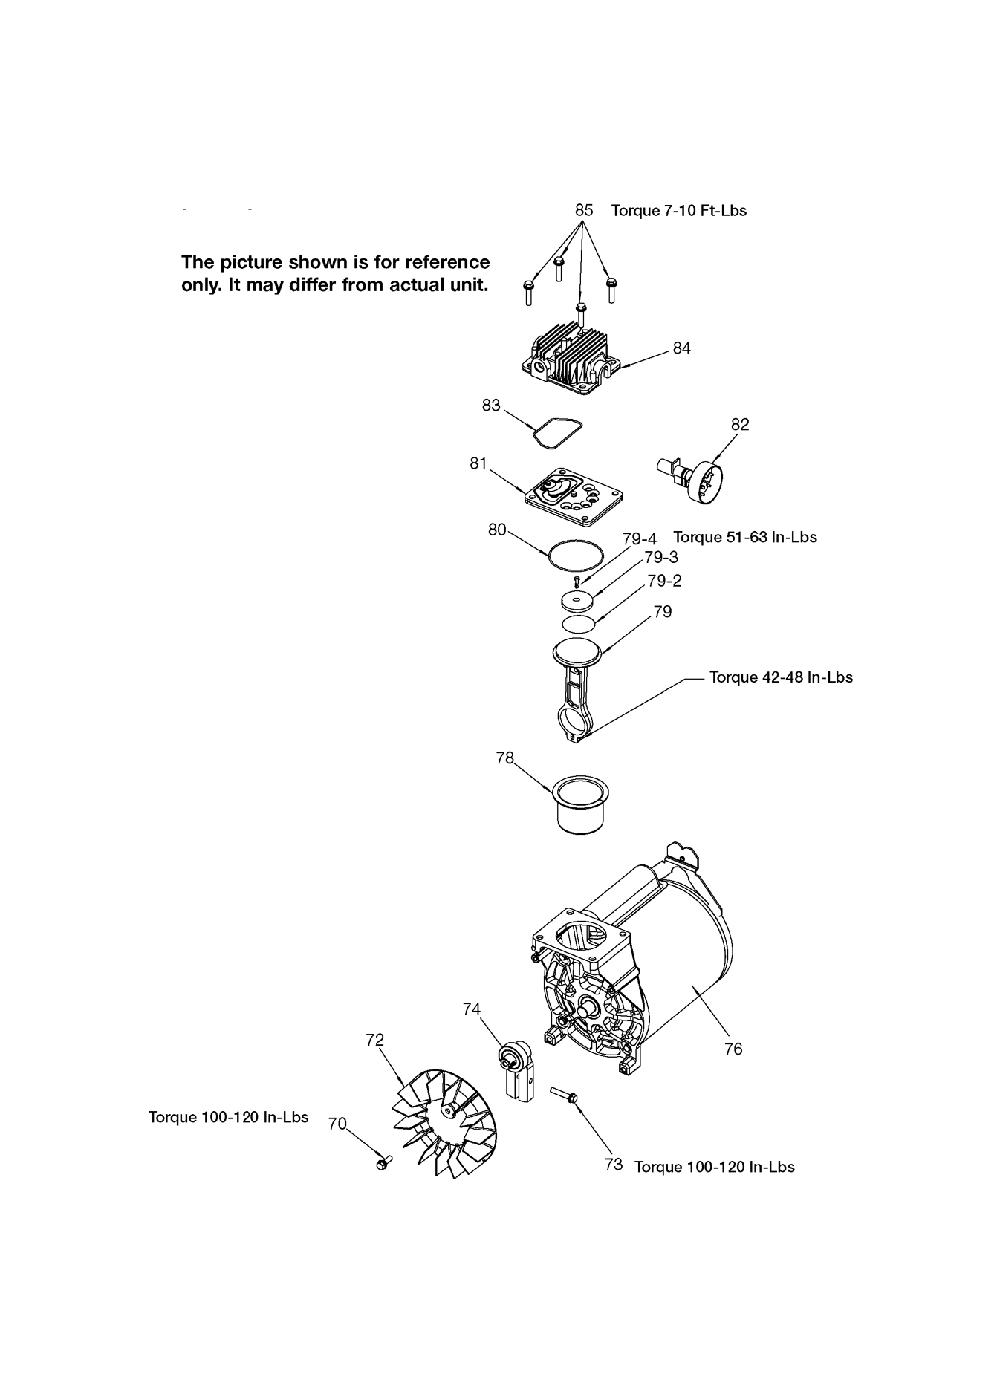 919-16558-Devilbiss-T0-PB-1Break Down